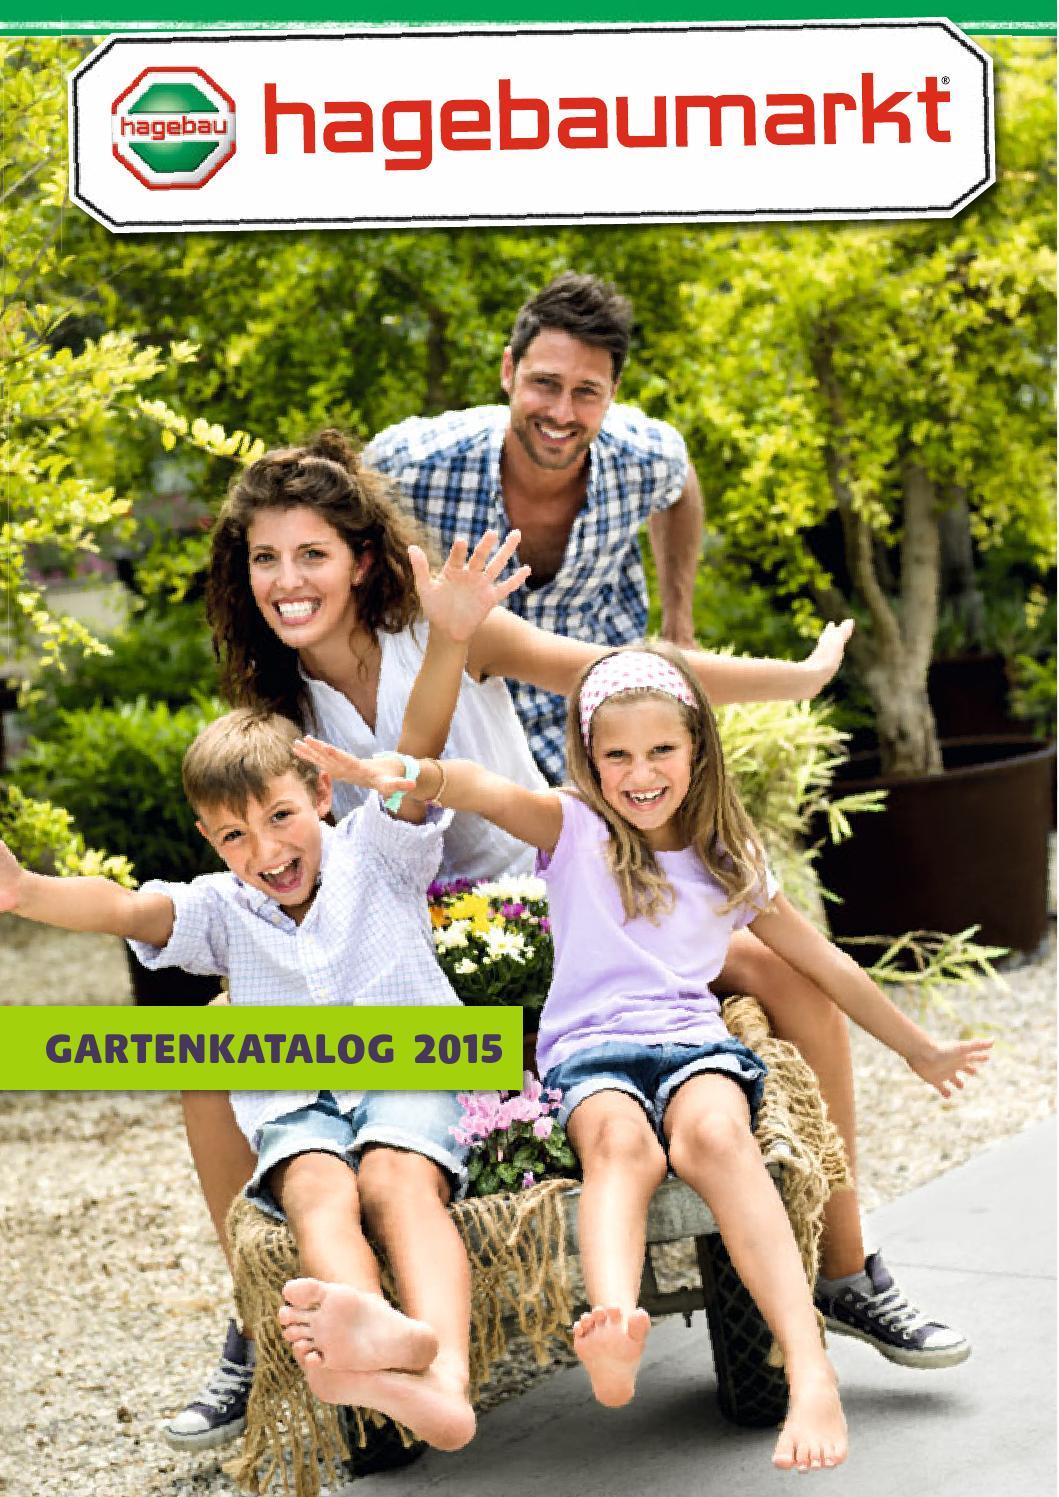 Hagebau Gartenkatalog 2015 By Busta Neumayr Og Issuu